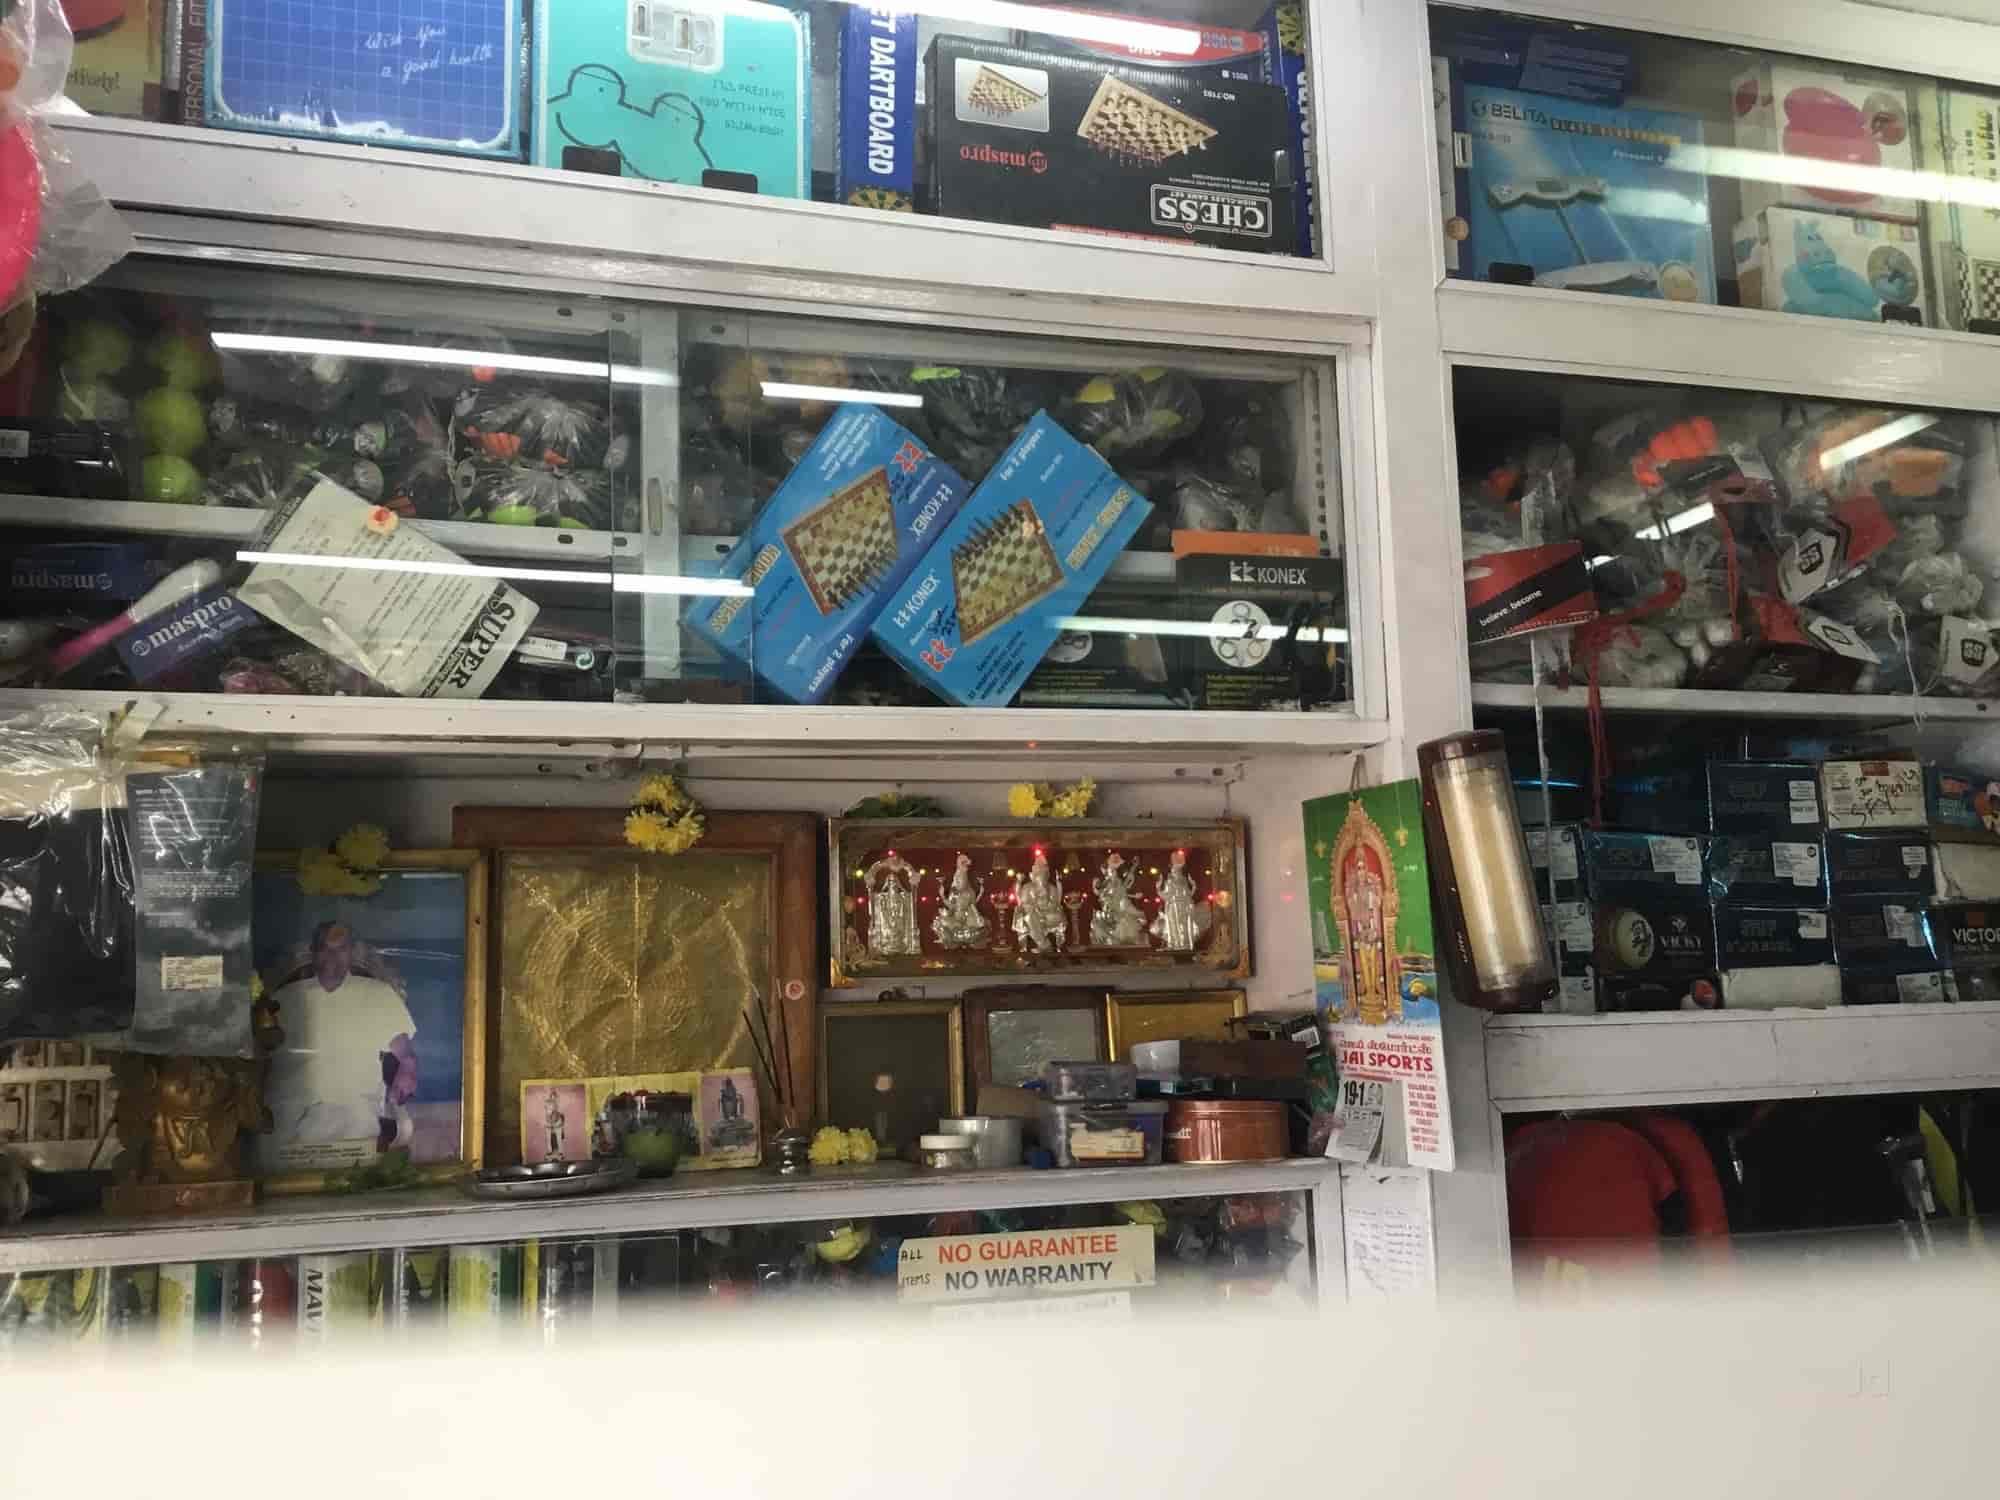 Jai sports thiruvanmiyur jay sports sports goods dealers in jai sports thiruvanmiyur jay sports sports goods dealers in chennai justdial solutioingenieria Gallery